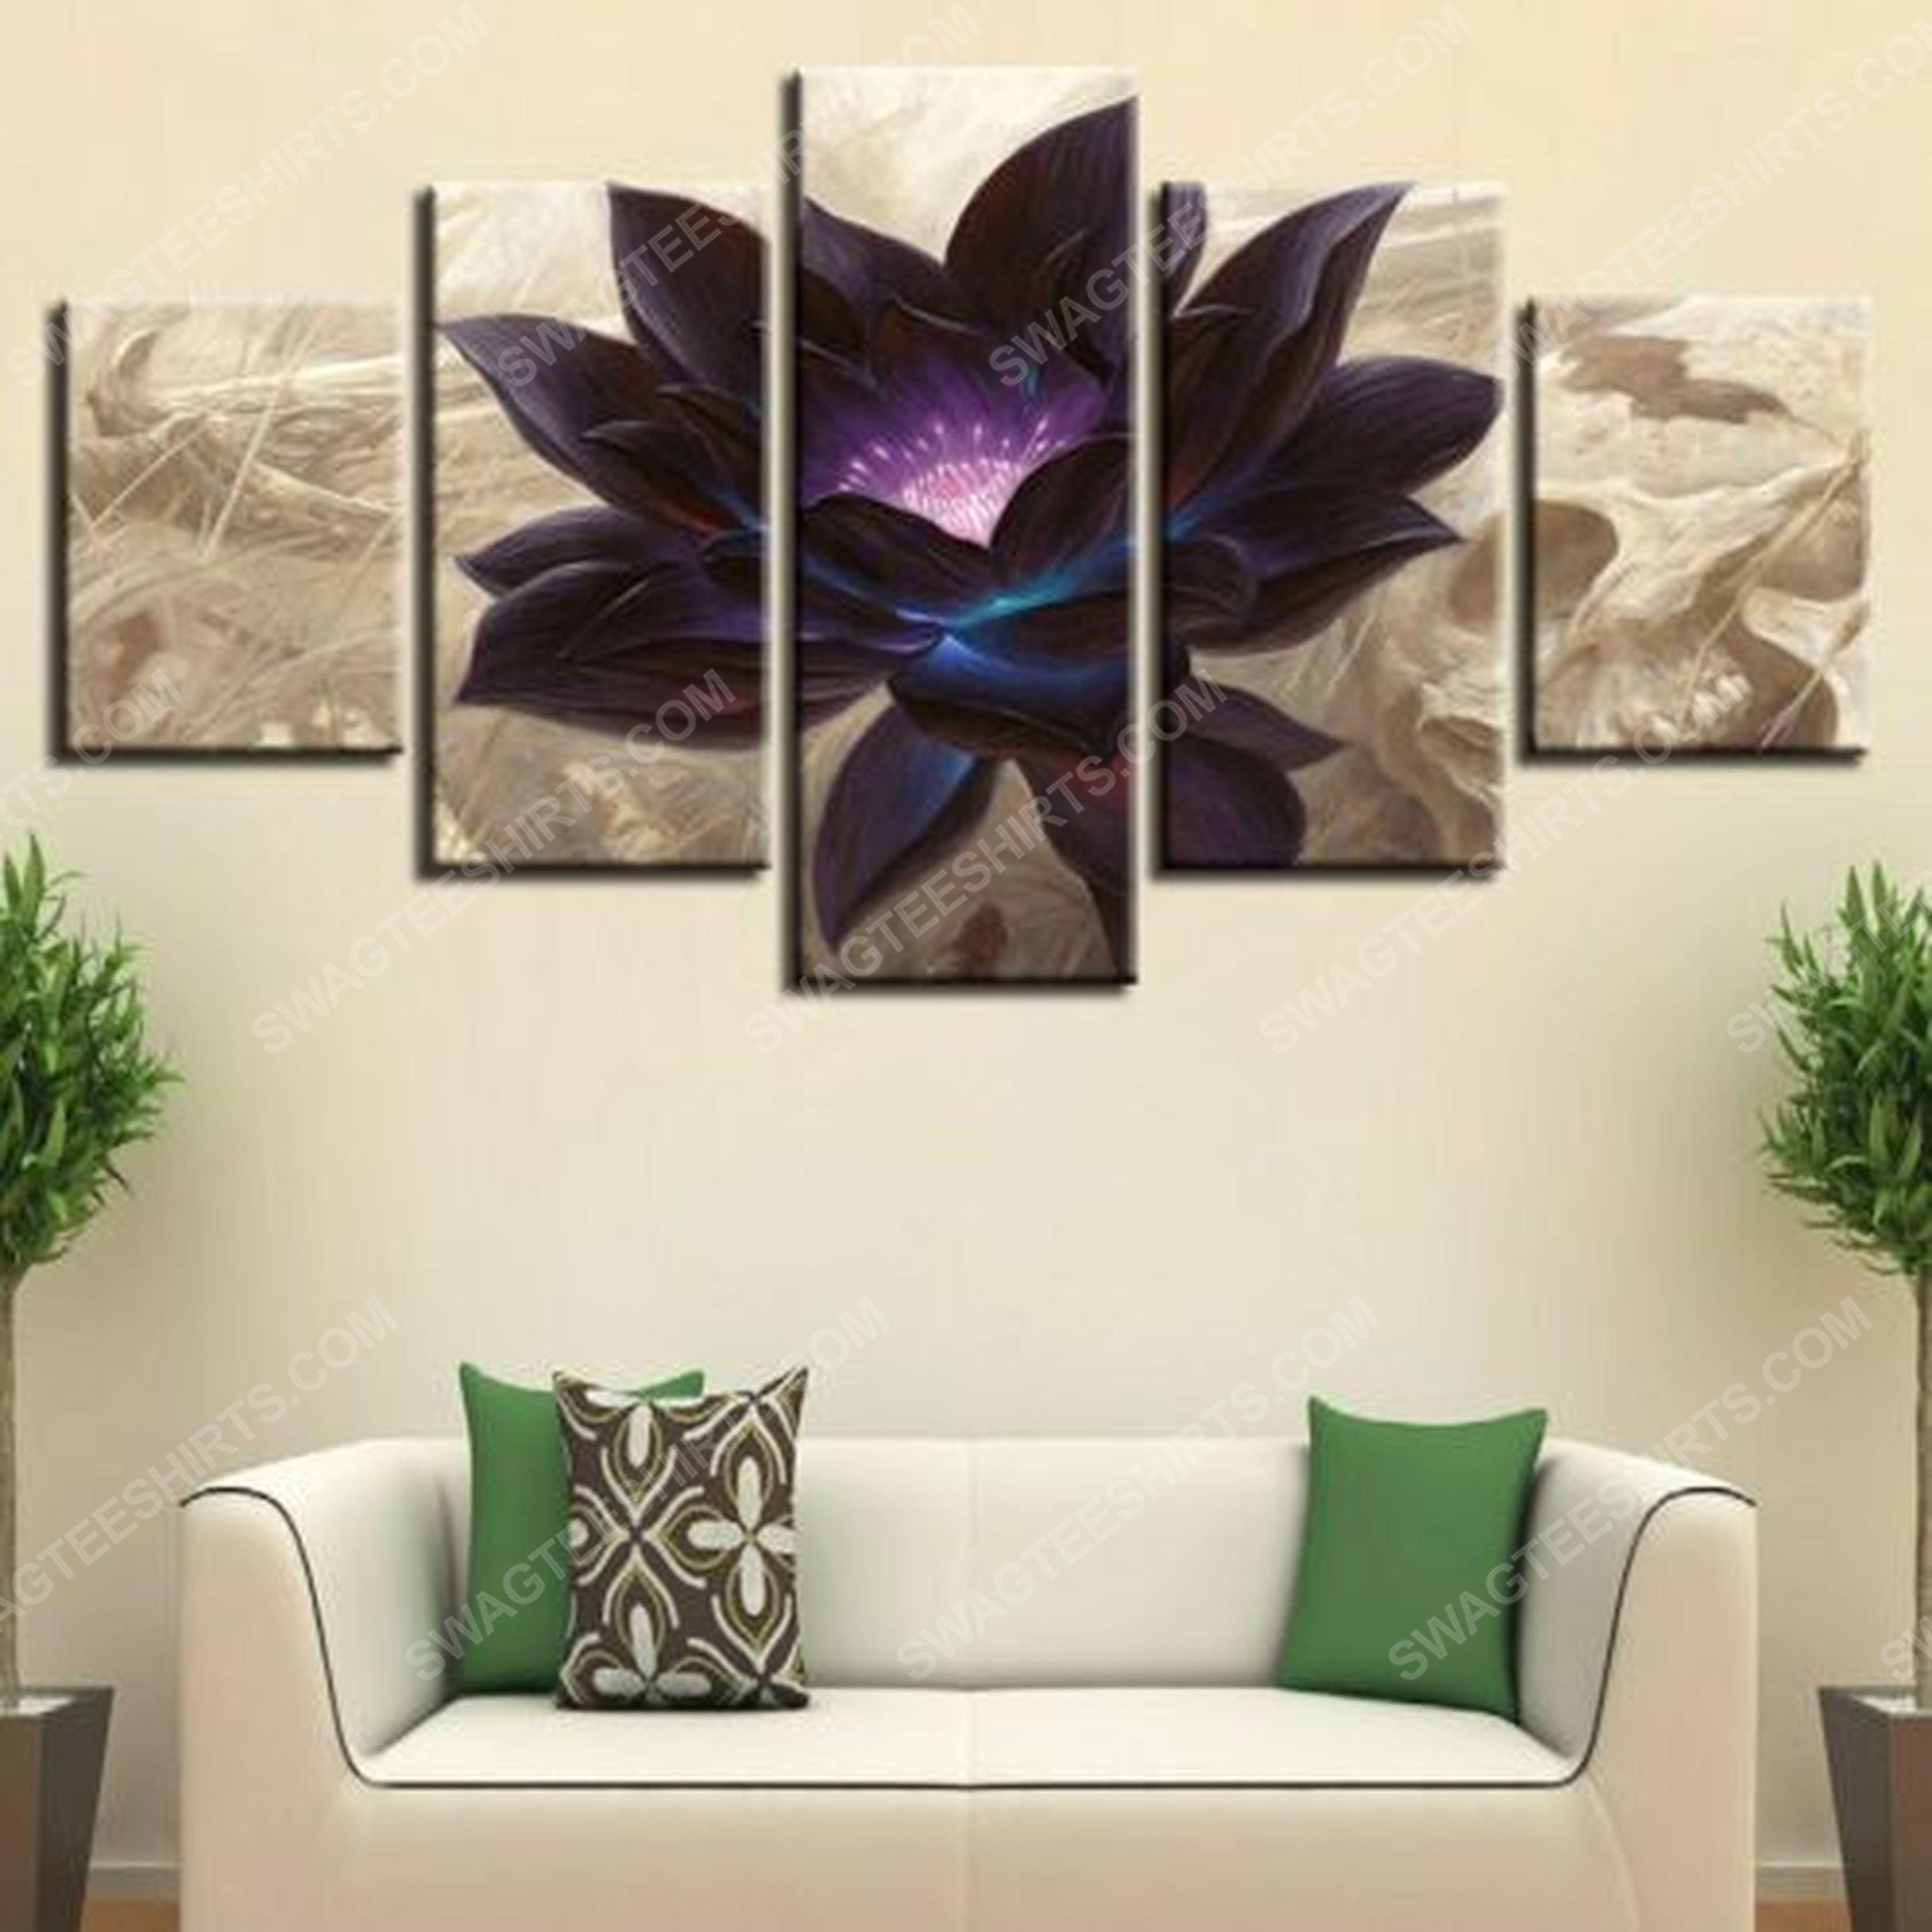 Black lotus flower print painting canvas wall art home decor